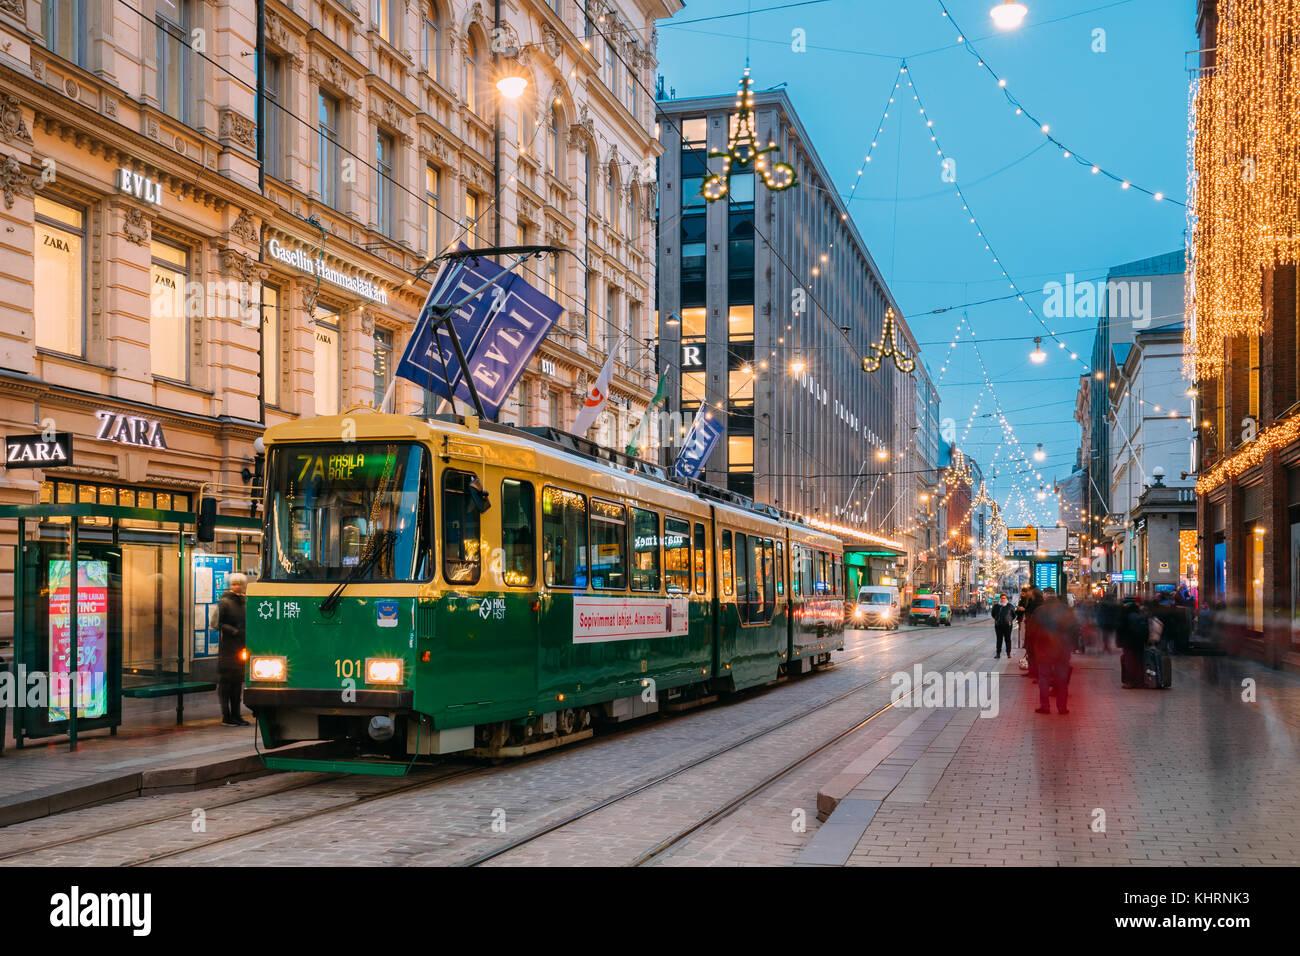 Helsinki, Finland - December 8, 2016: Tram Departs From A Stop On Aleksanterinkatu Street. Night View Of Aleksanterinkatu - Stock Image